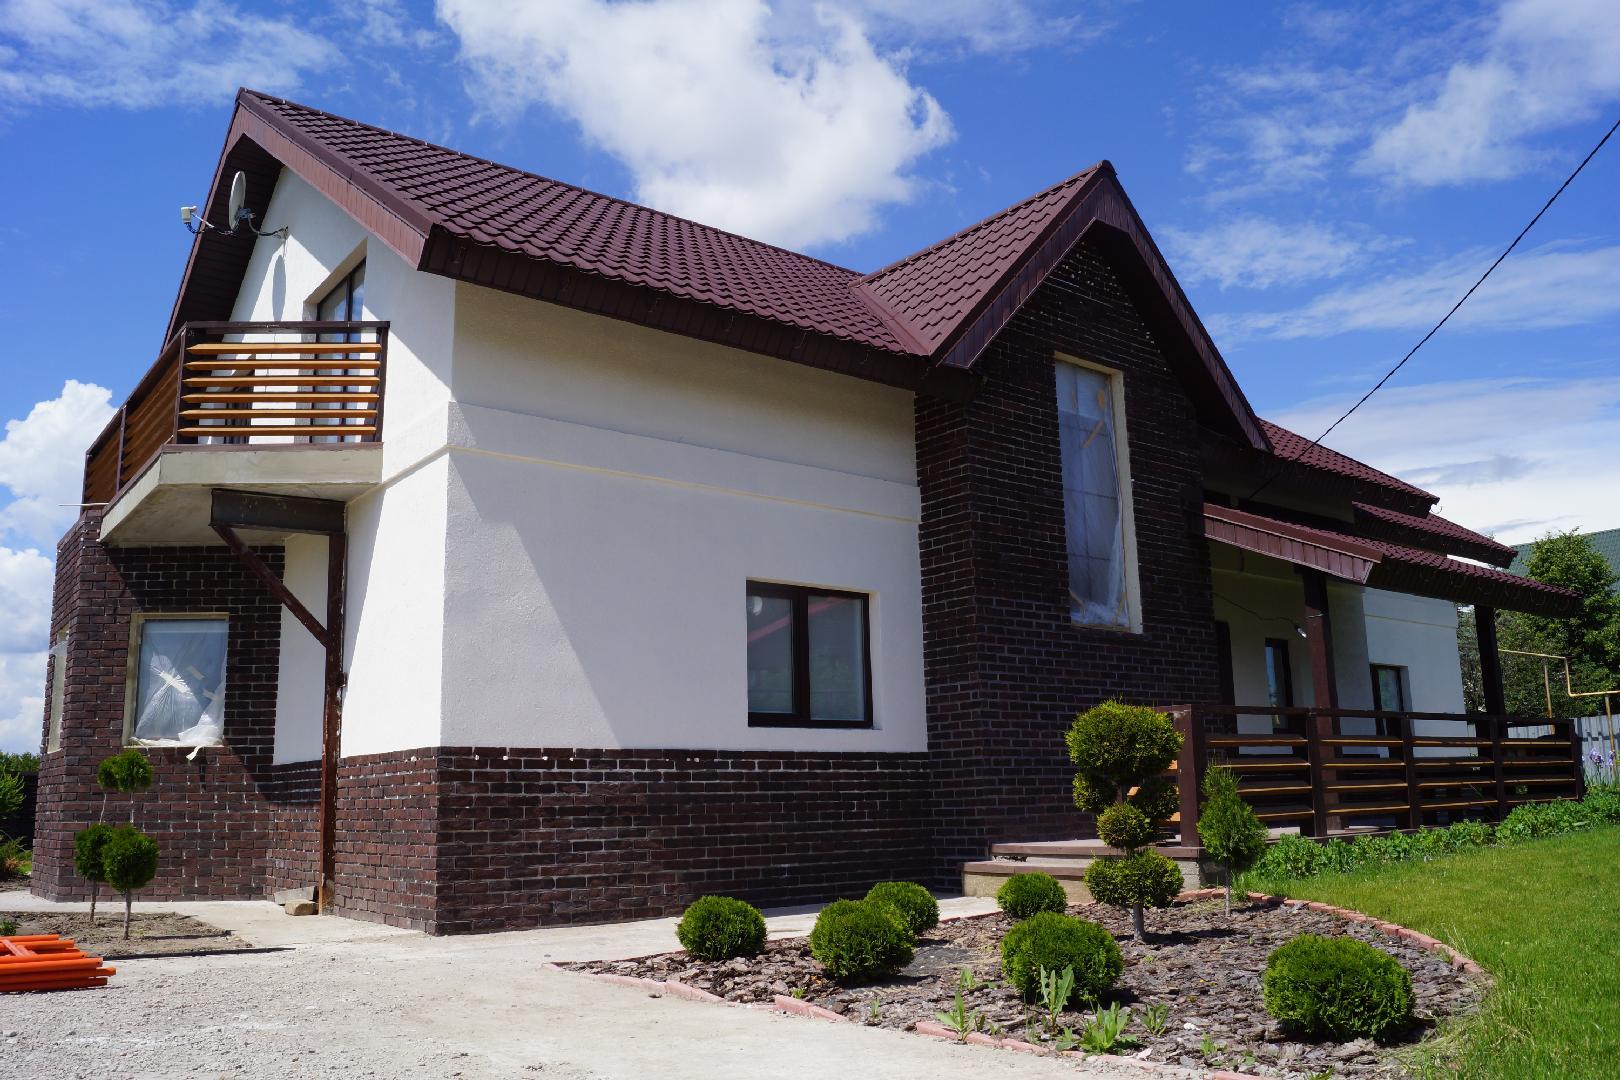 Фасады домов фото цветовая гамма готовые дома